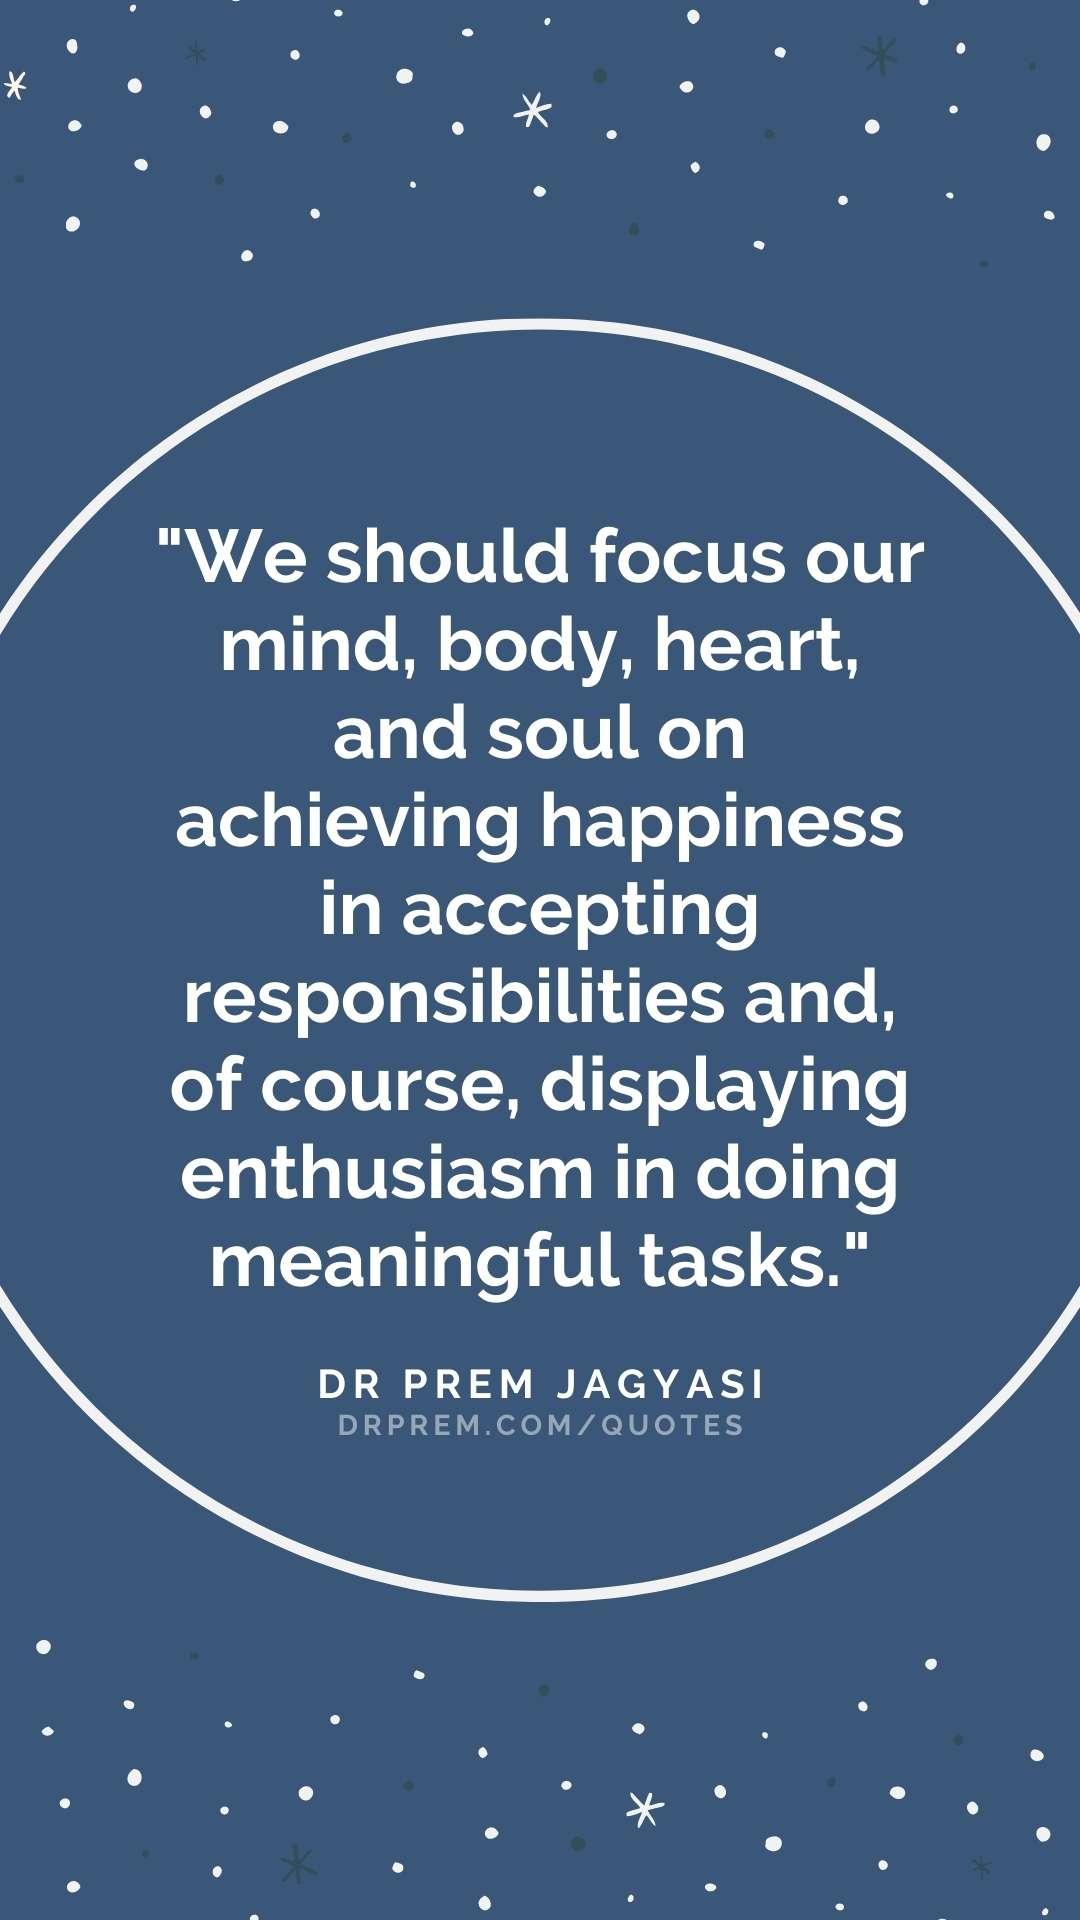 We should focus our mind, body, heart and soul- Dr Prem Jagyasi Quote